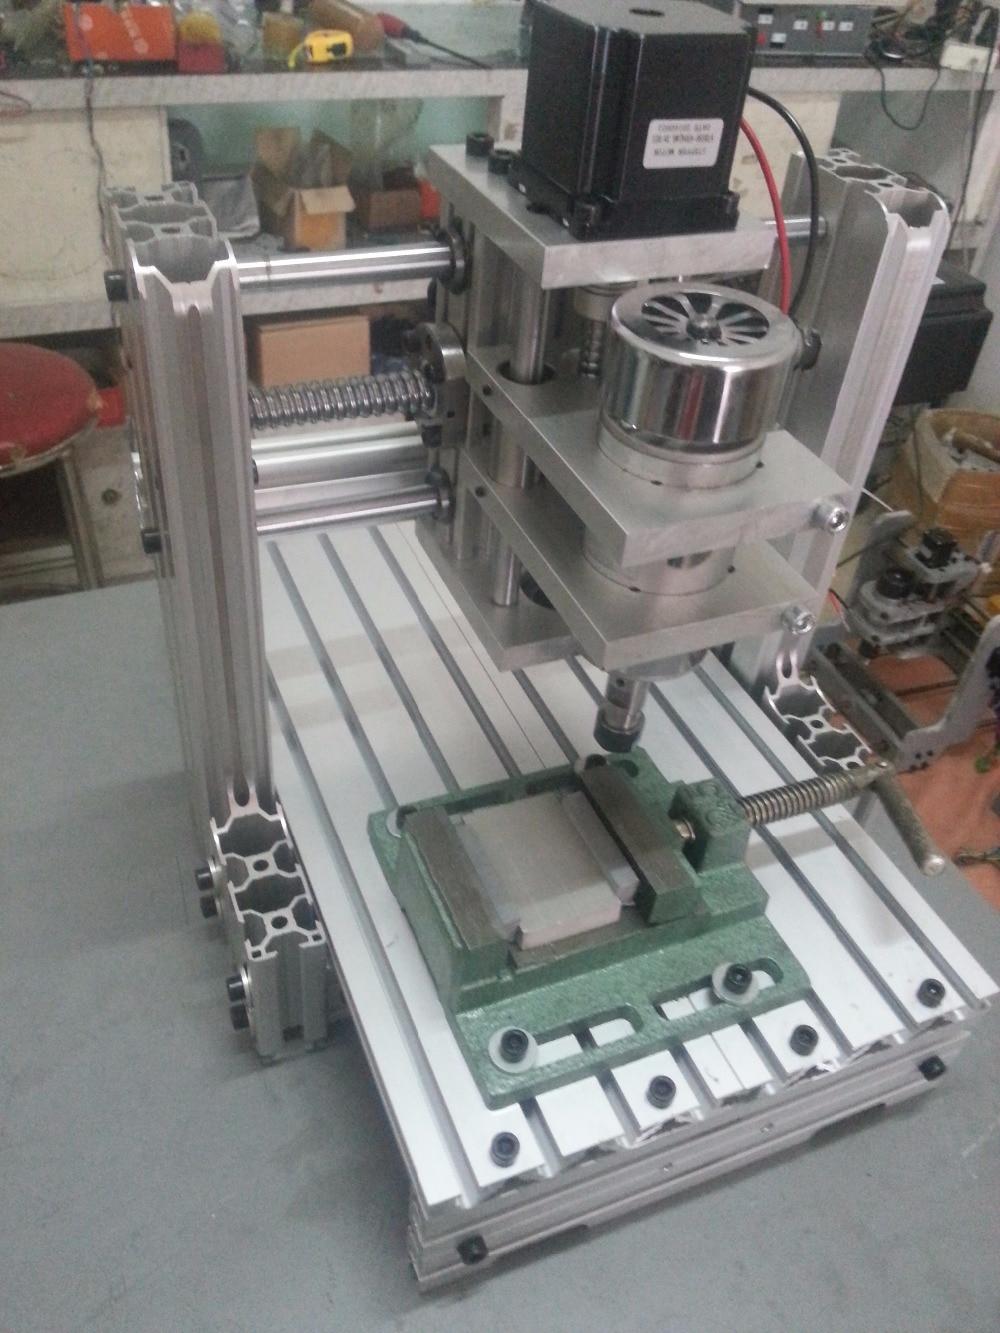 Small CNC Engraving Machine 2030 DIY Aluminum Alloy 3th Axis With Driver Cnc Usb MACH3 Ac110-220v